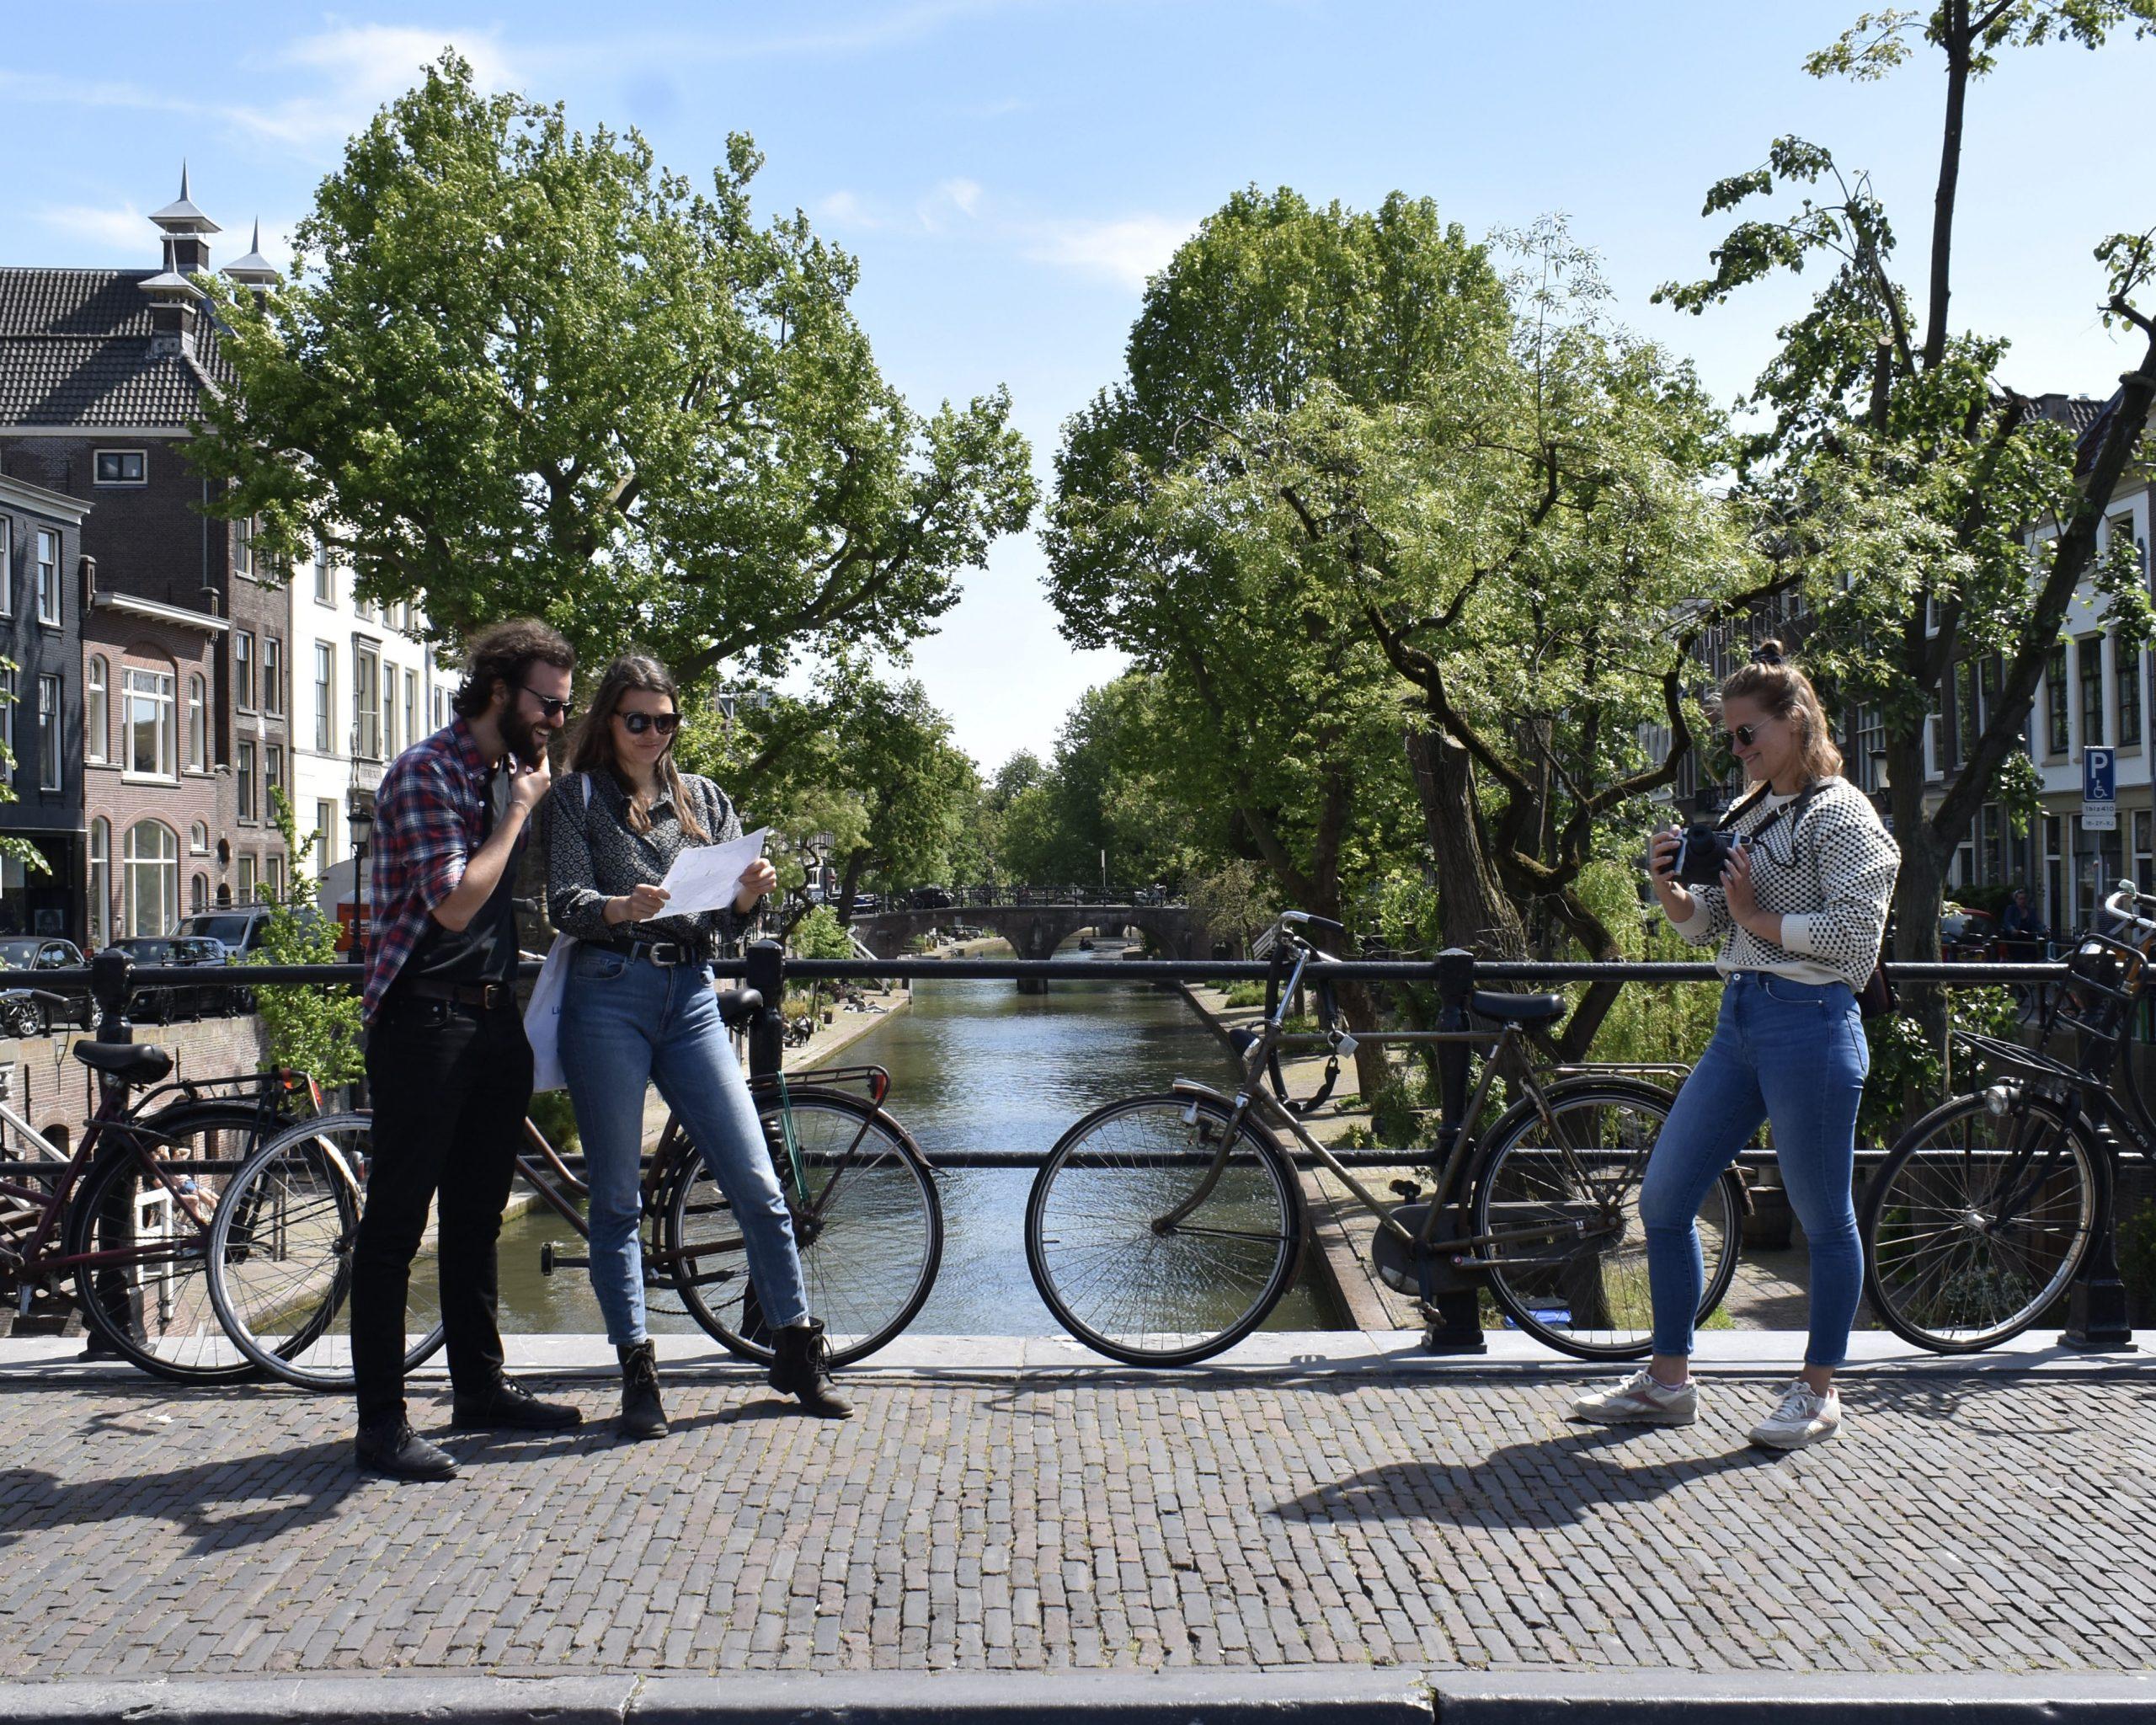 Utrecht Photo Challenge